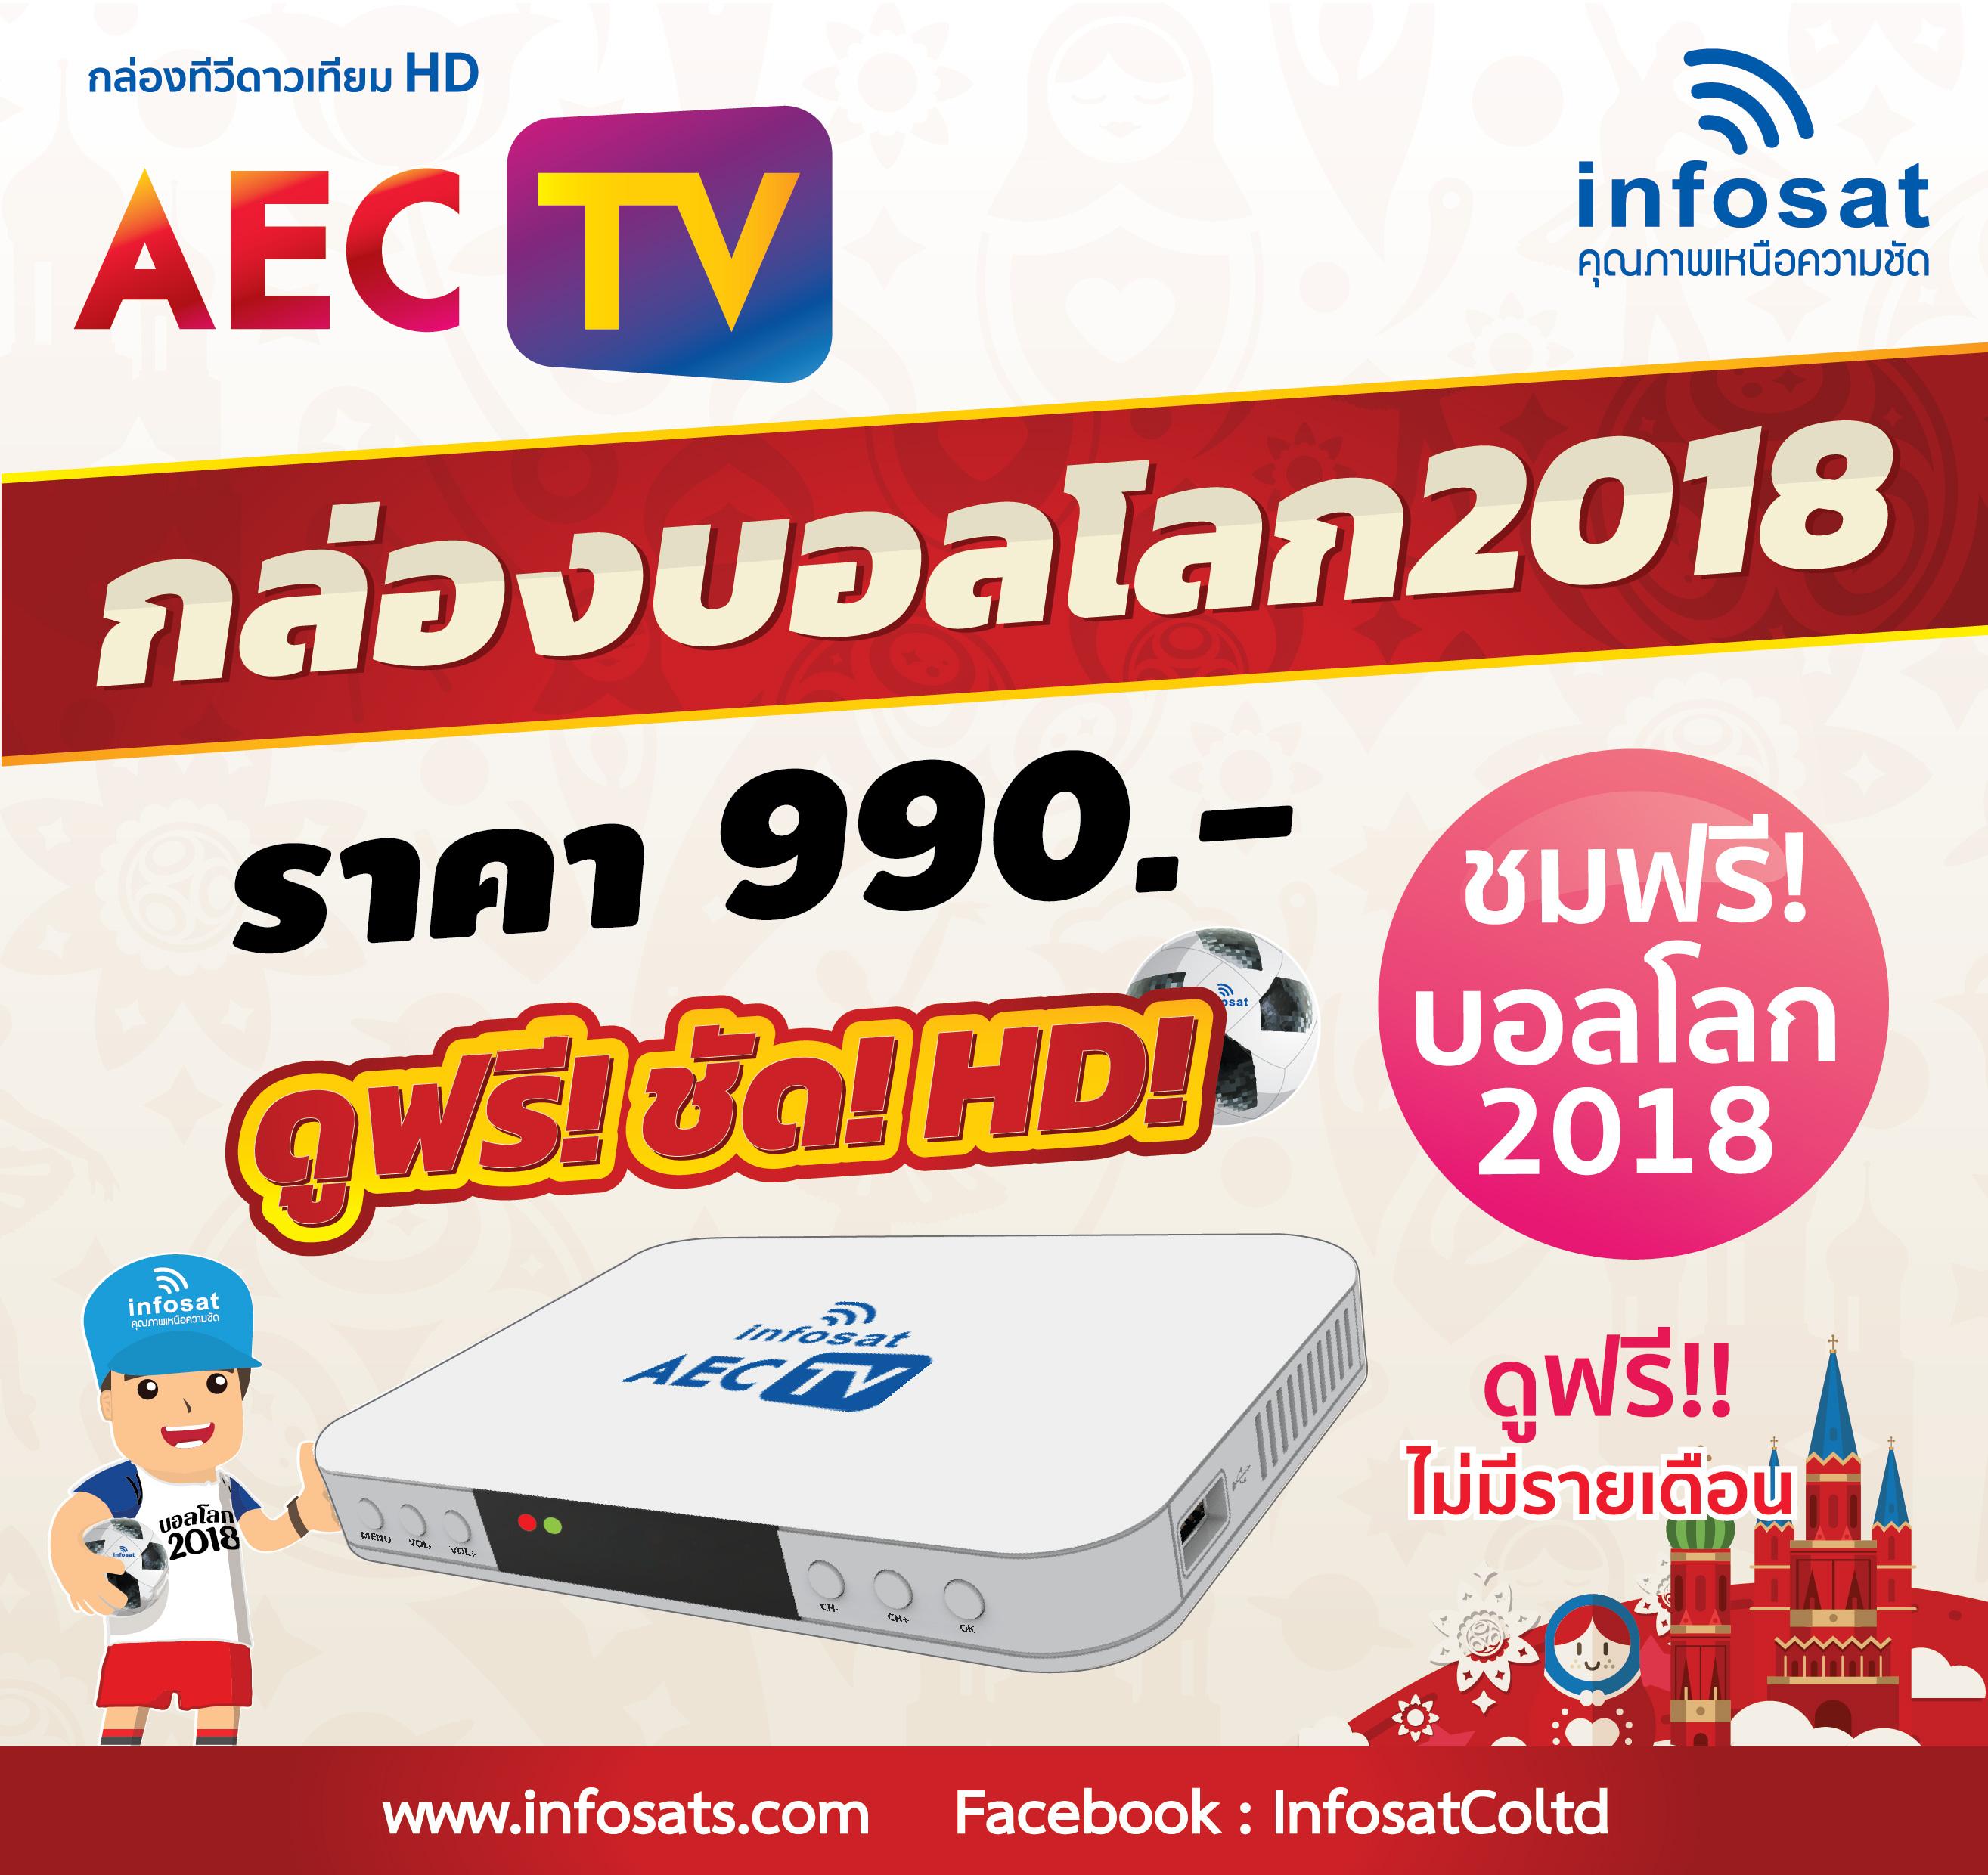 INFOSAT กล่องรับสัญญาณดาวเทียม HD รุ่น AEC TV